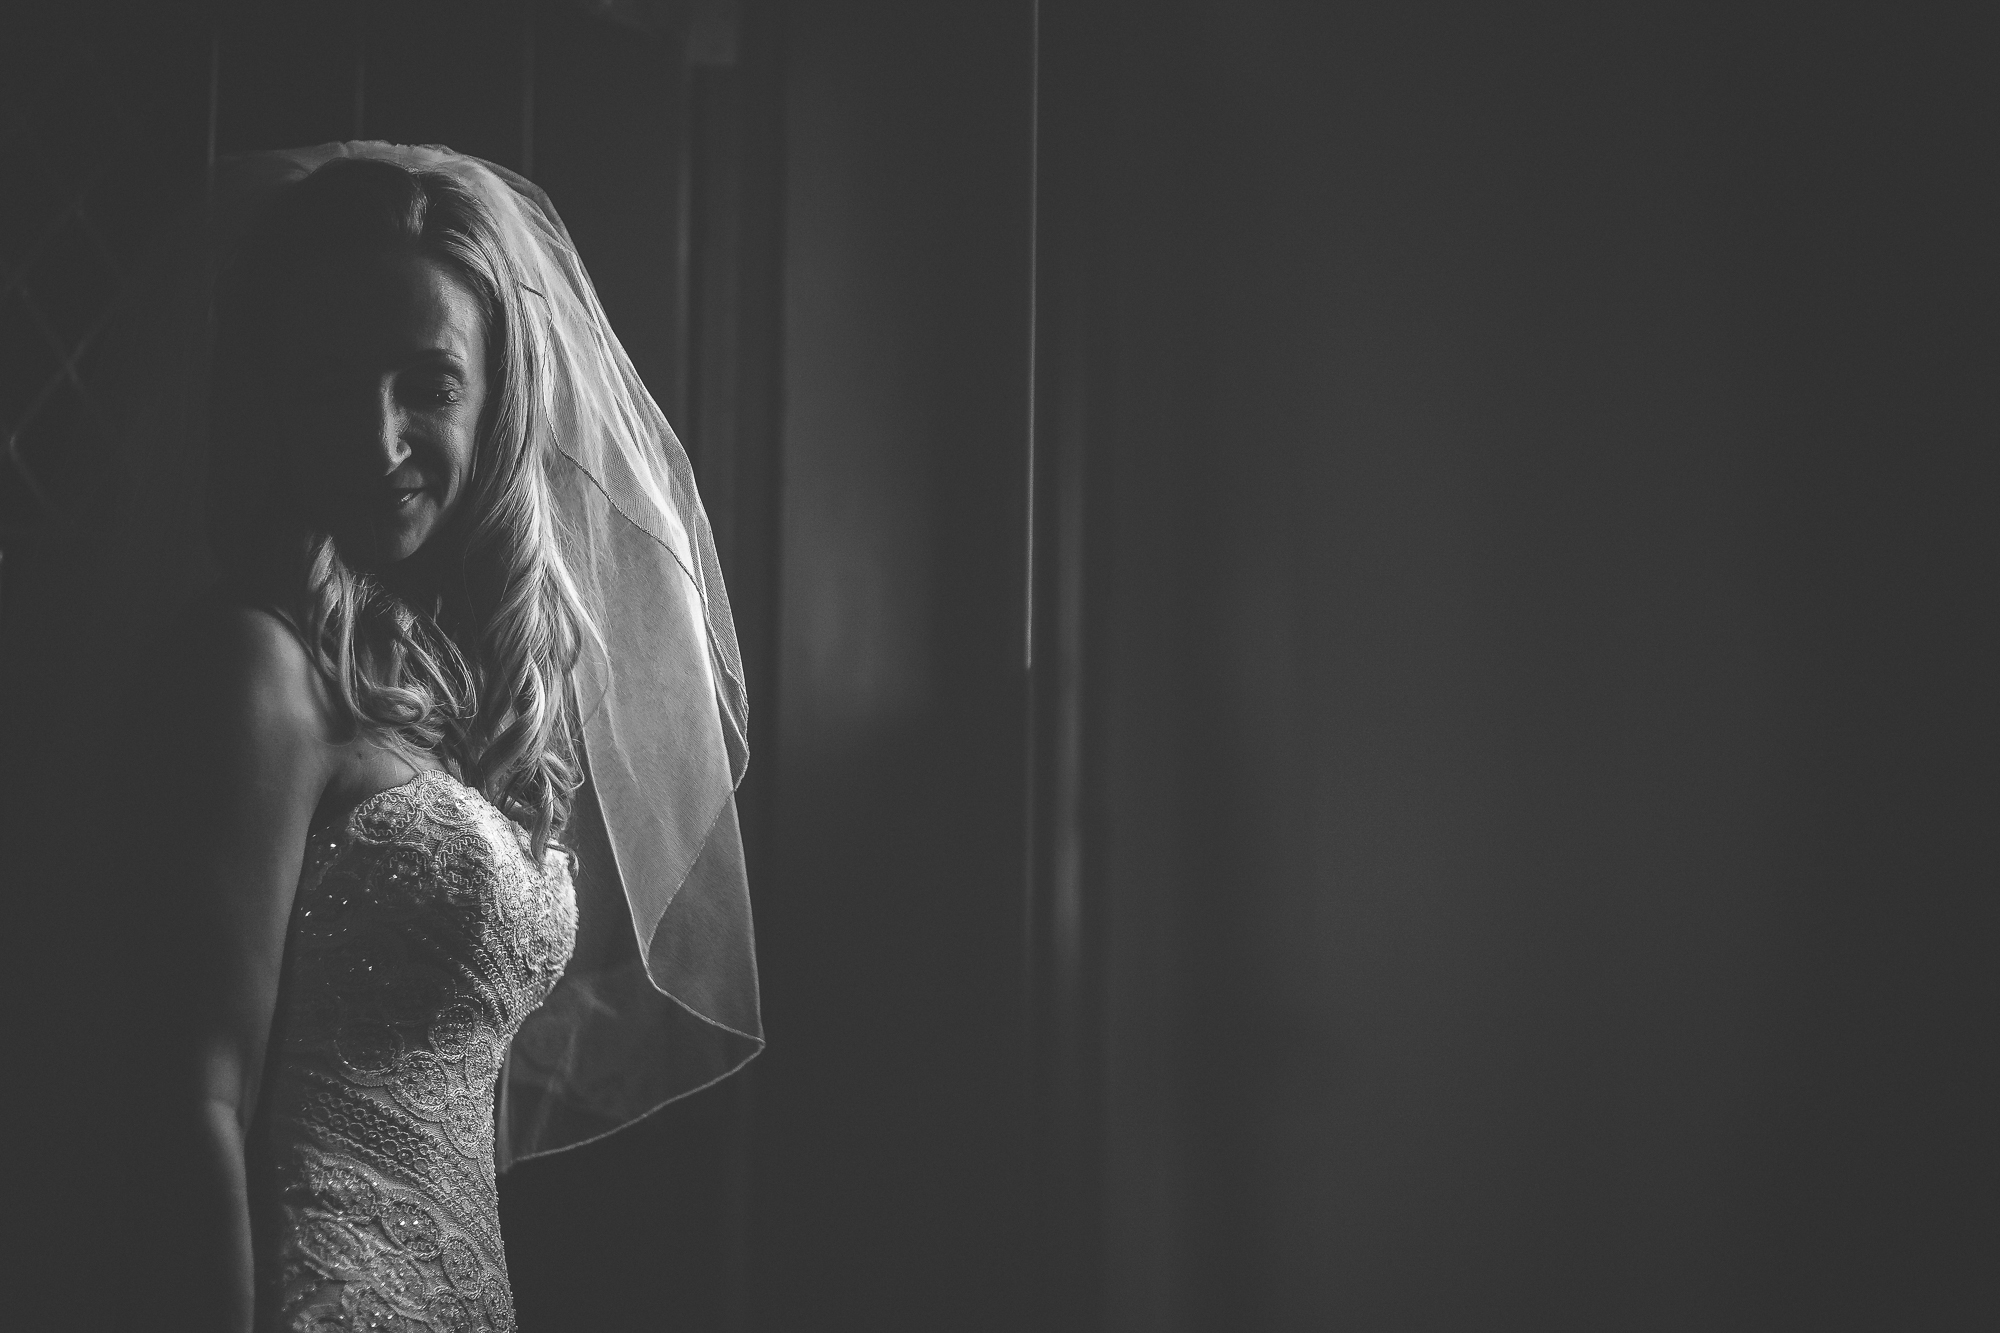 glensheen mansion duluth wedding photography-12.jpg